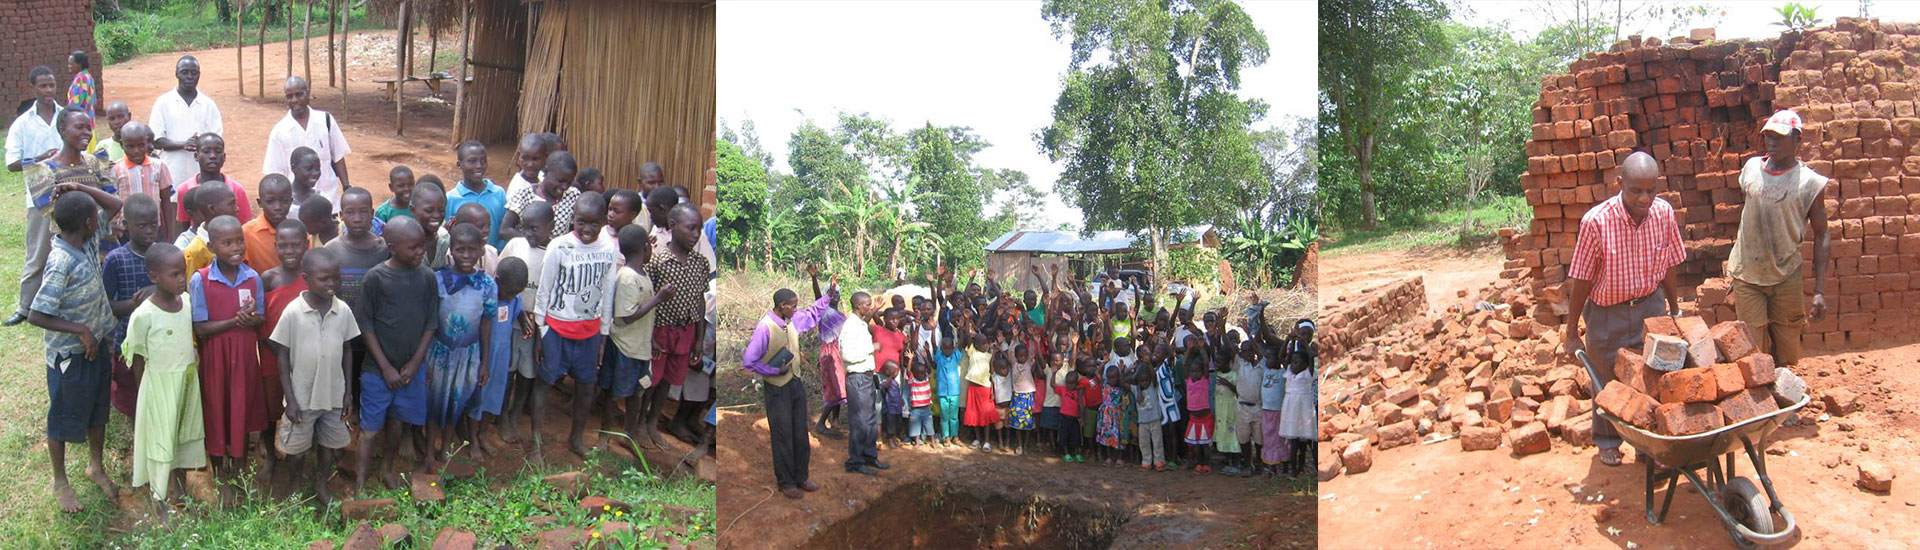 Building of Orphanage in Uganda